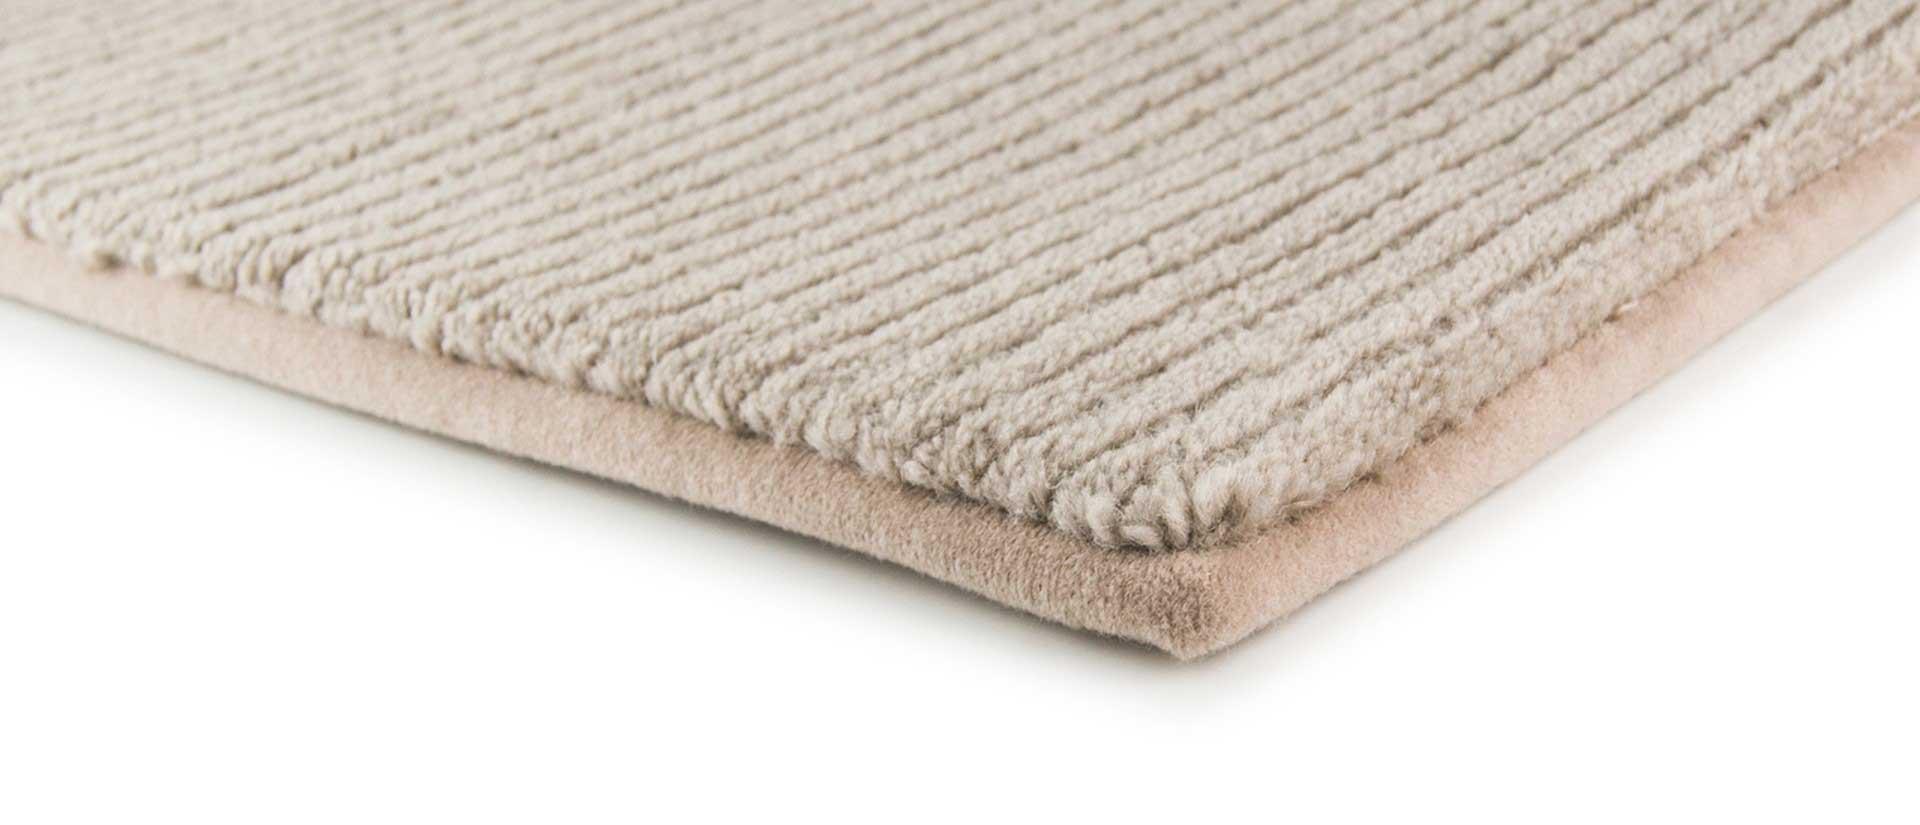 Wool carpet wool carpet 100% natural TTRDMAU